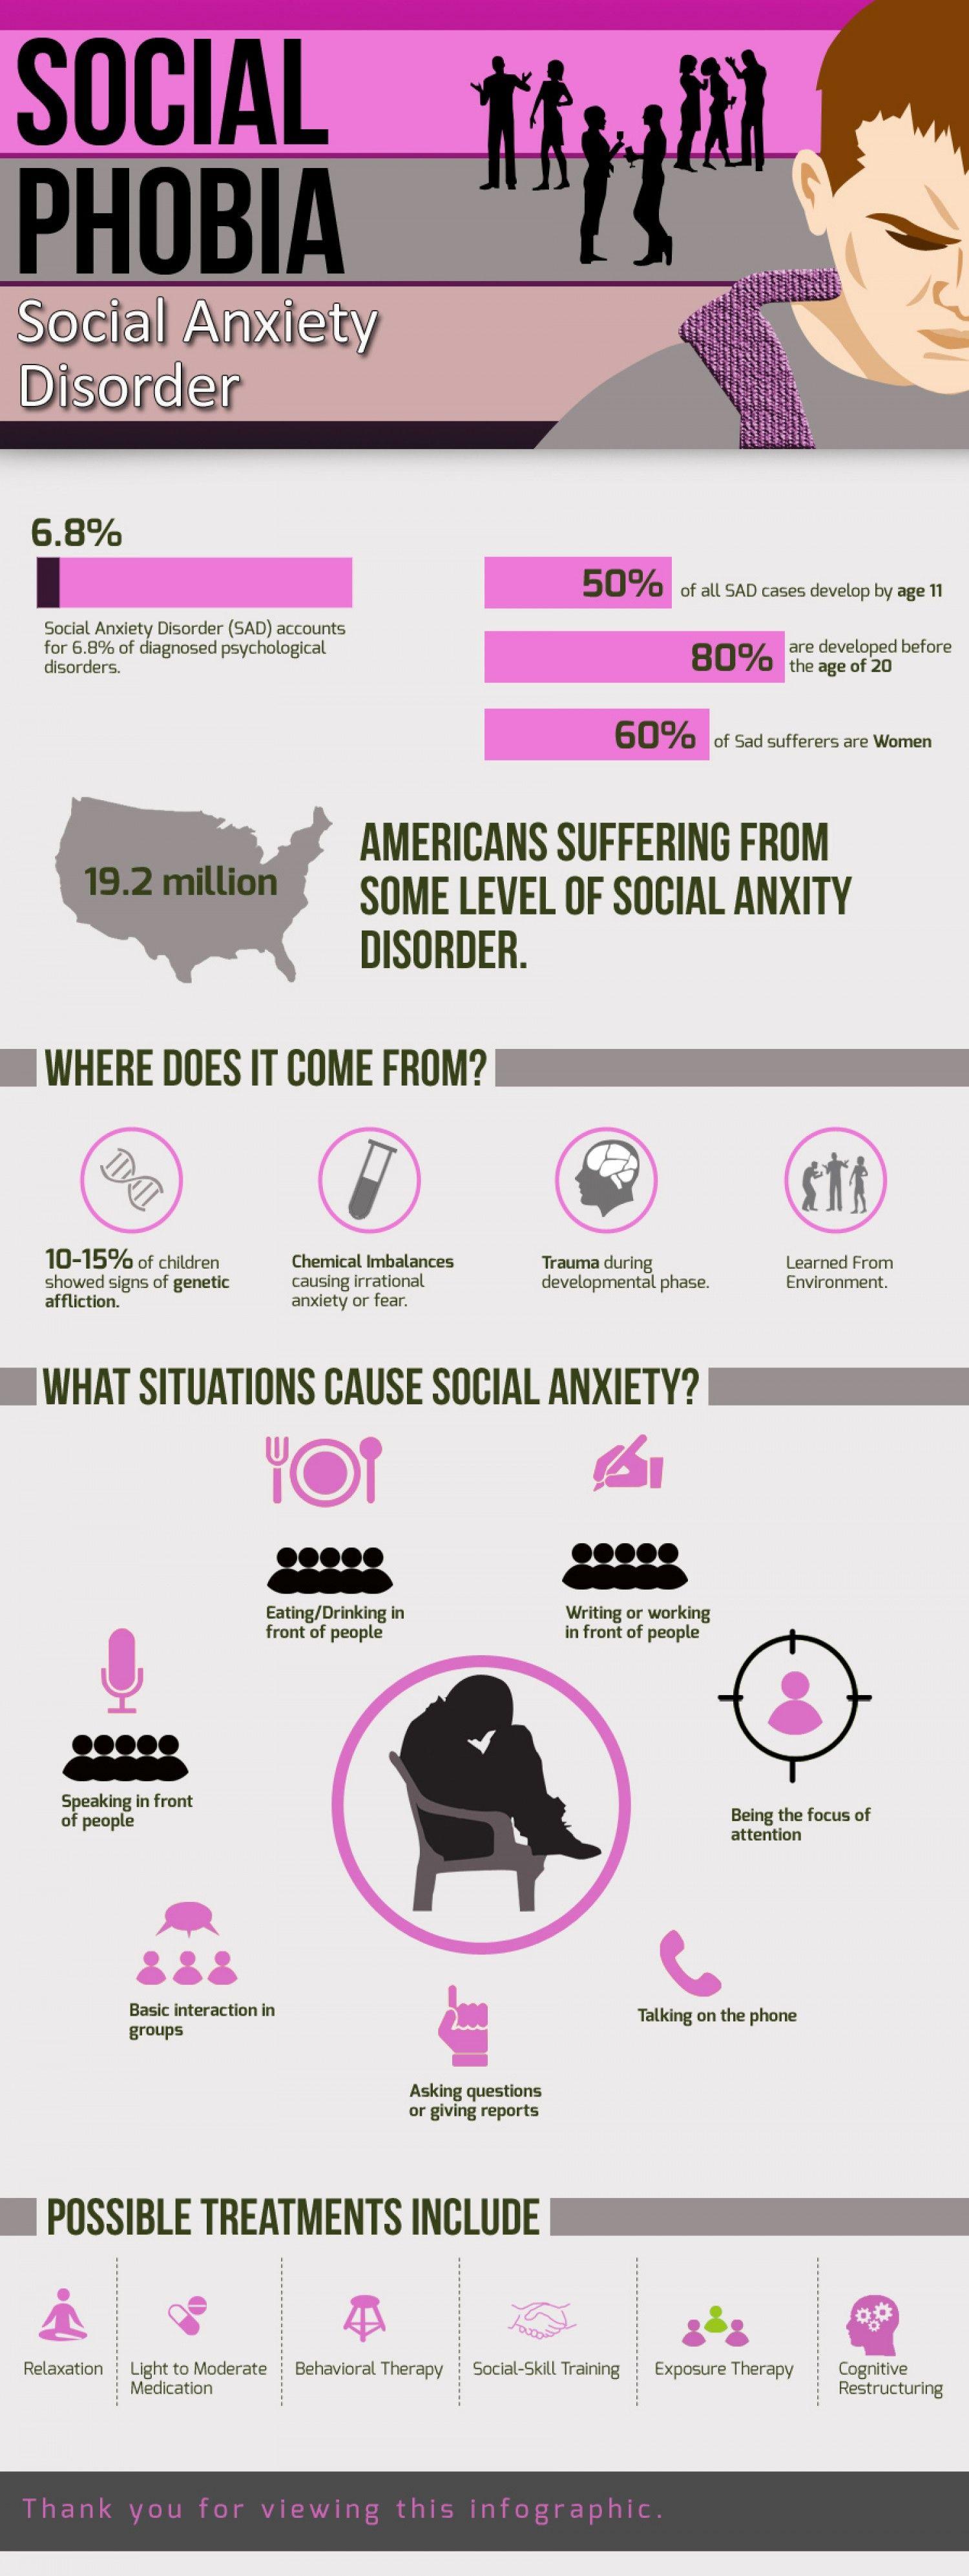 Social Anxiety Infographic Anxiety Phobia Mentalhealth